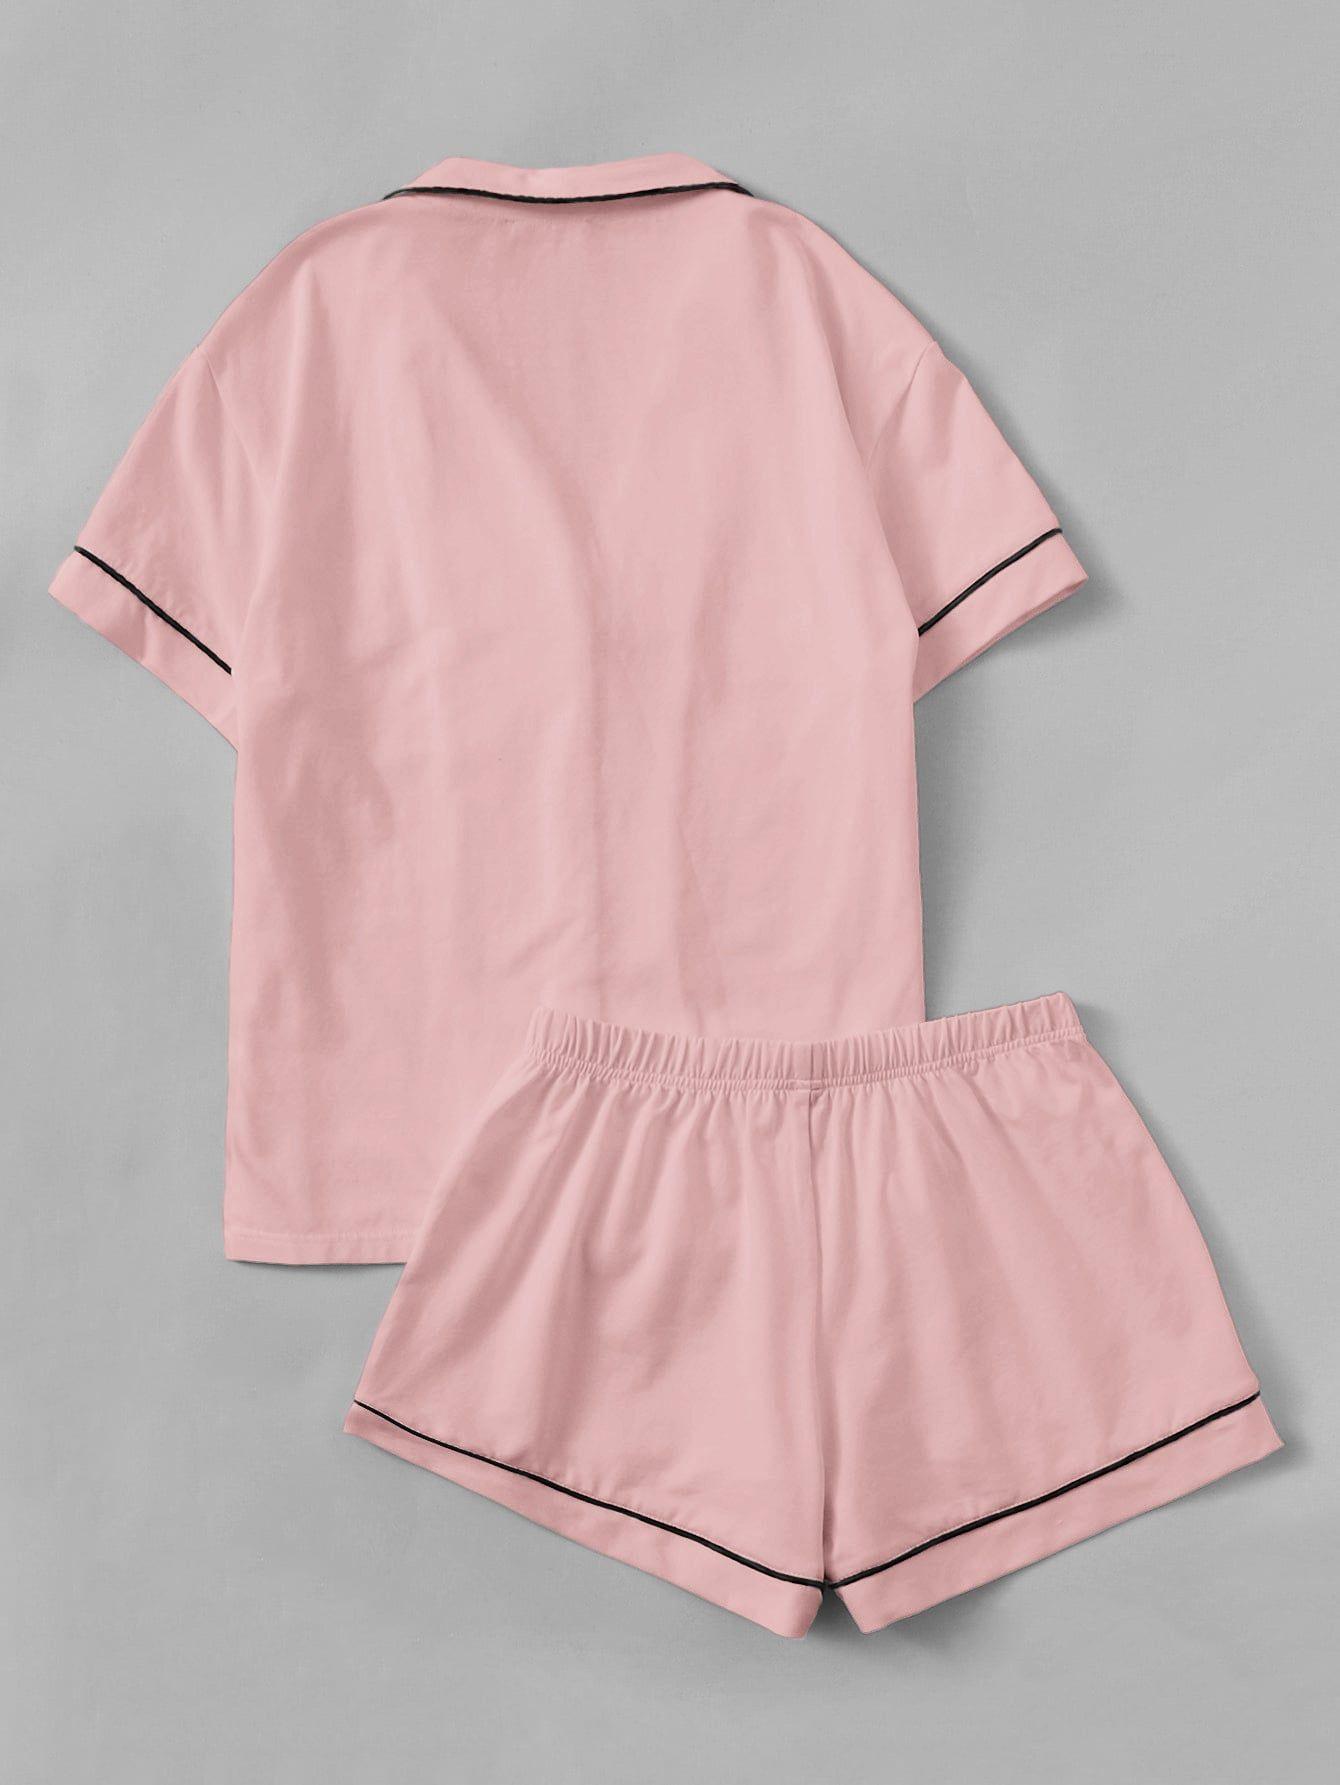 76e79ccde5 Contrast Piping Pocket Front Shirt & Shorts PJ Set Pocket#Front#Contrast.  Visit. March 2019